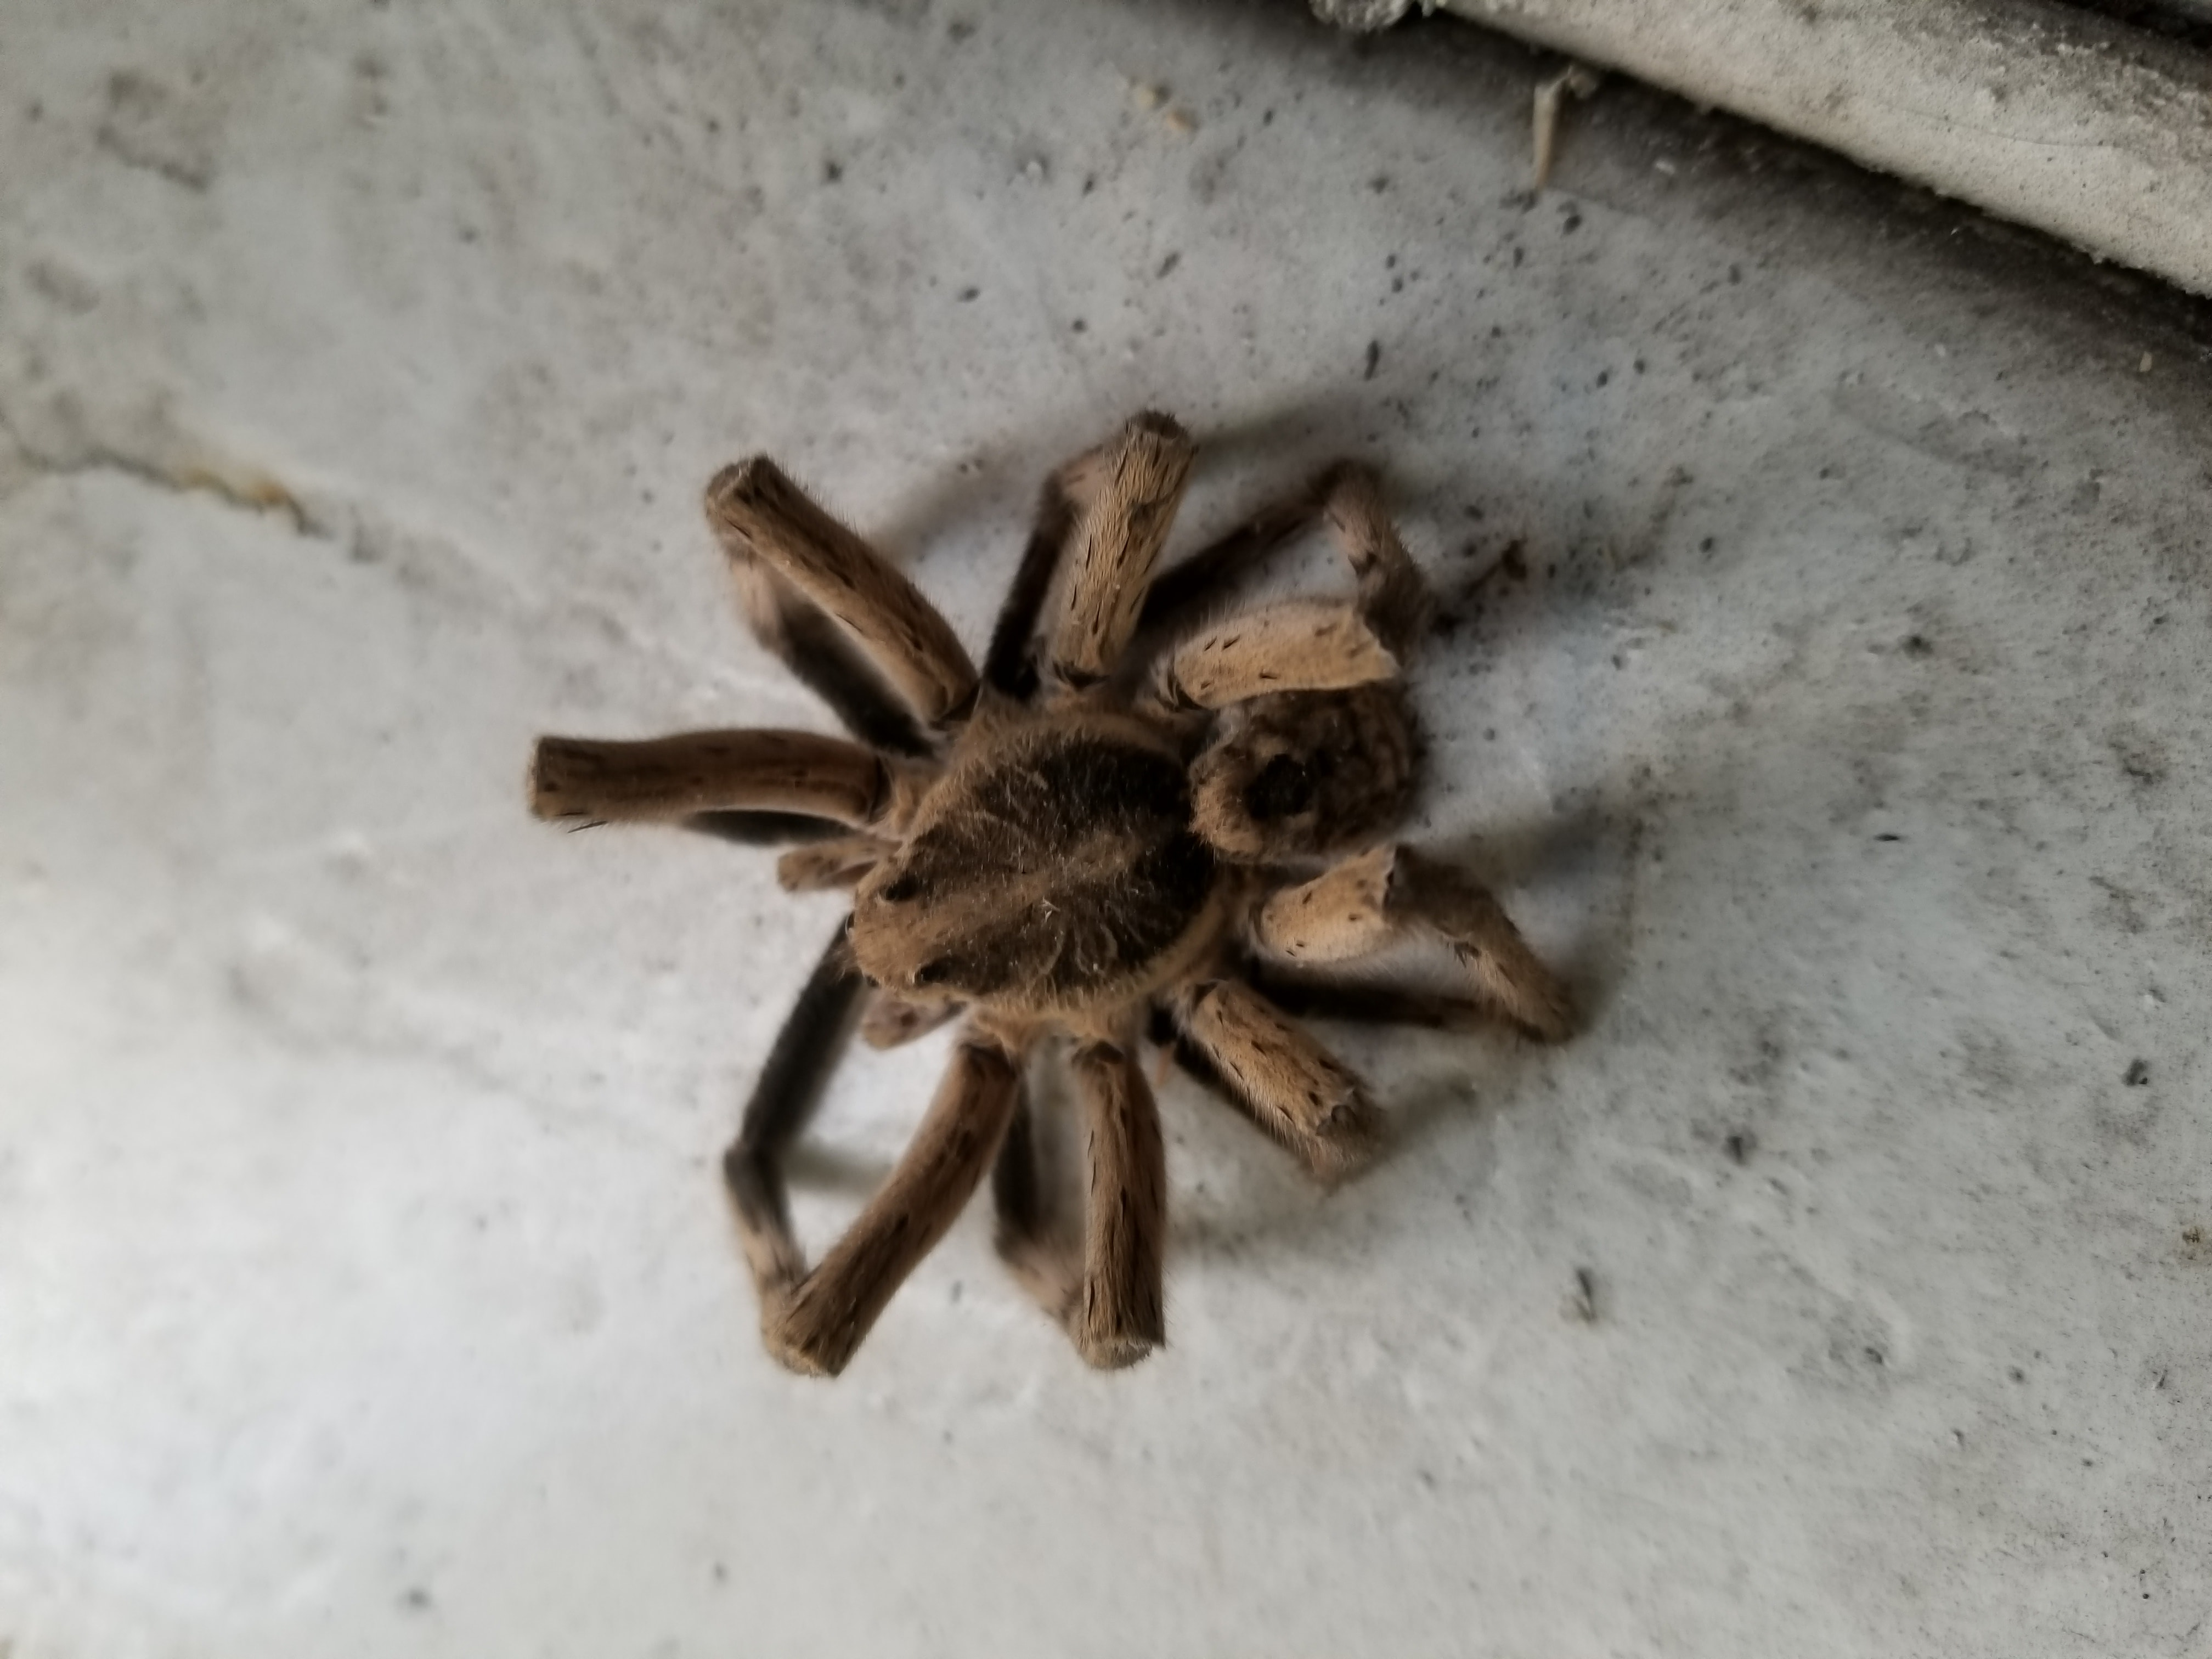 Picture of Hogna carolinensis (Carolina Wolf Spider) - Dorsal